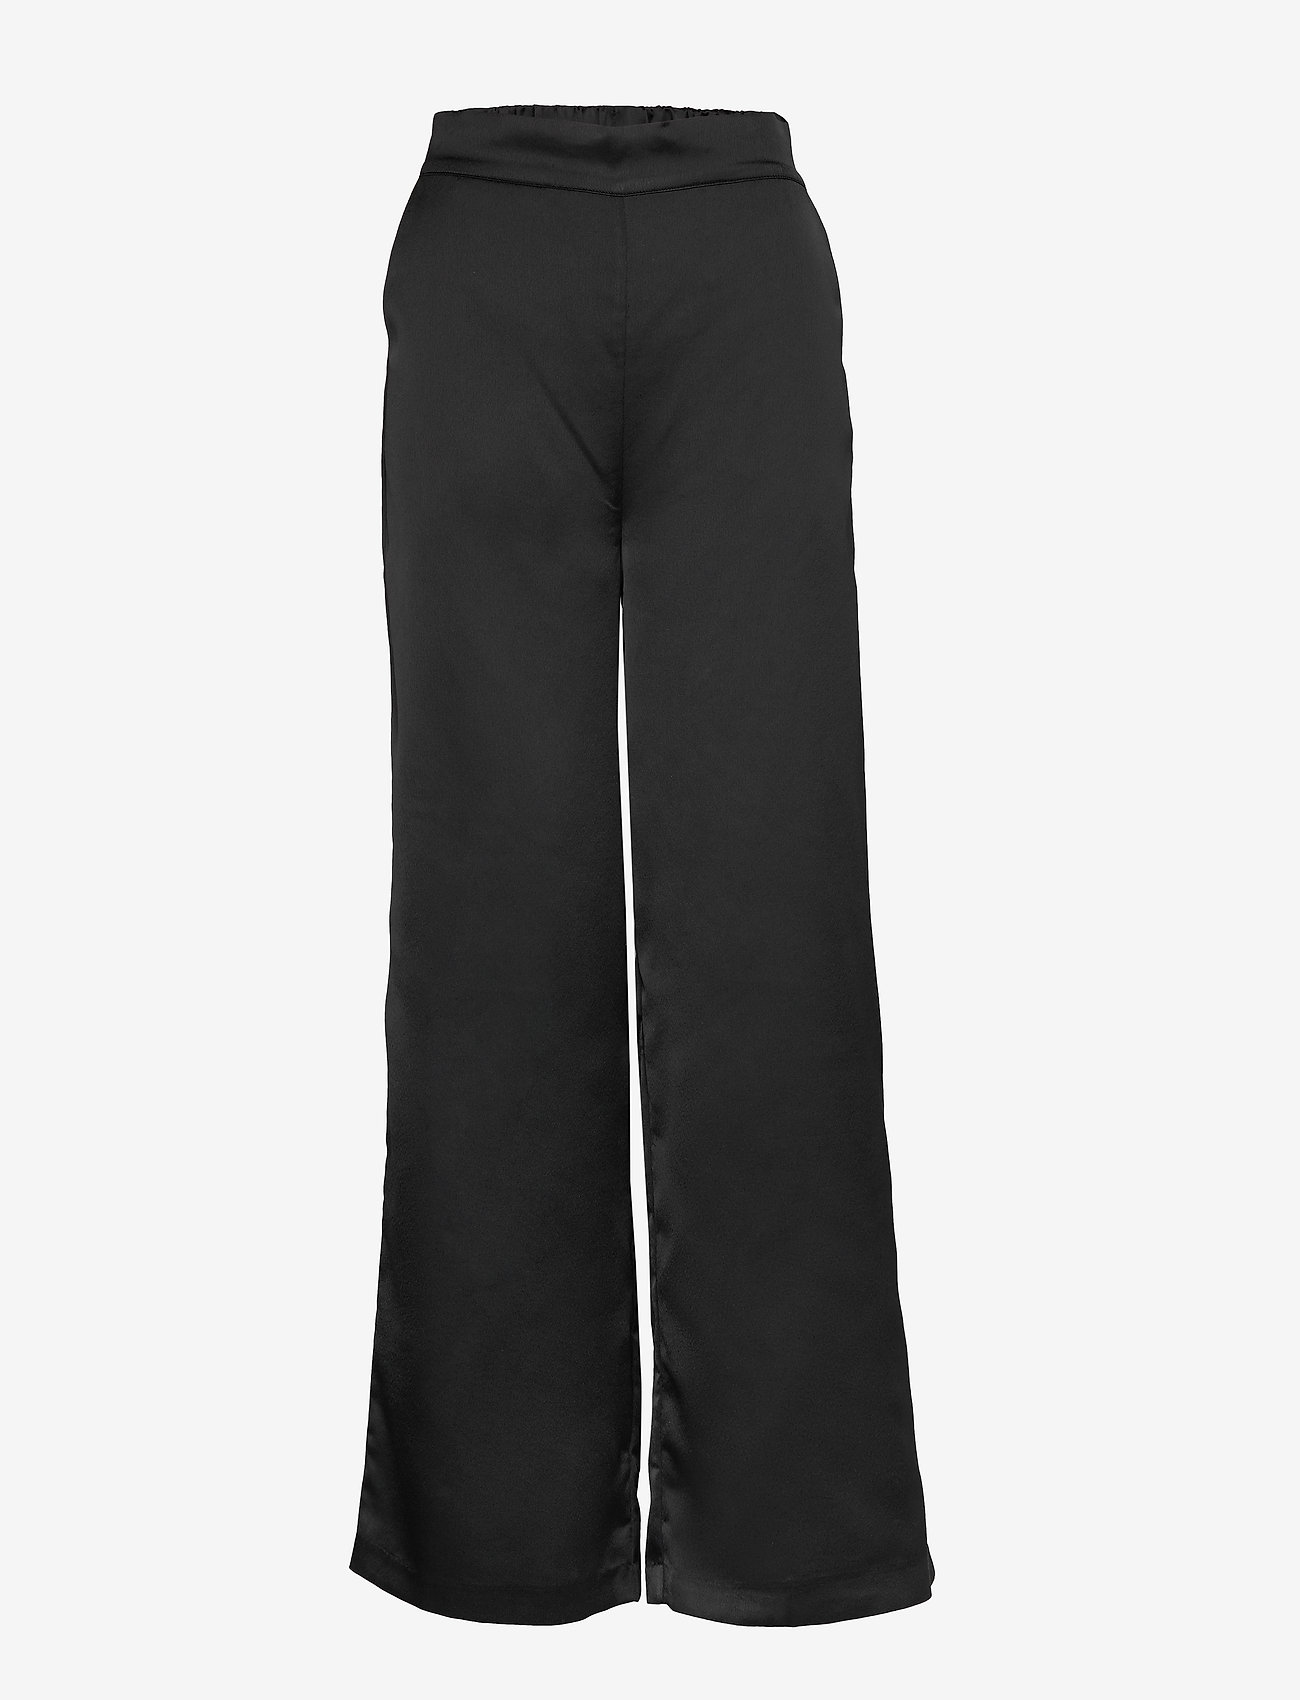 Vila - VIALICE HWRE PANTS - vide bukser - black - 0